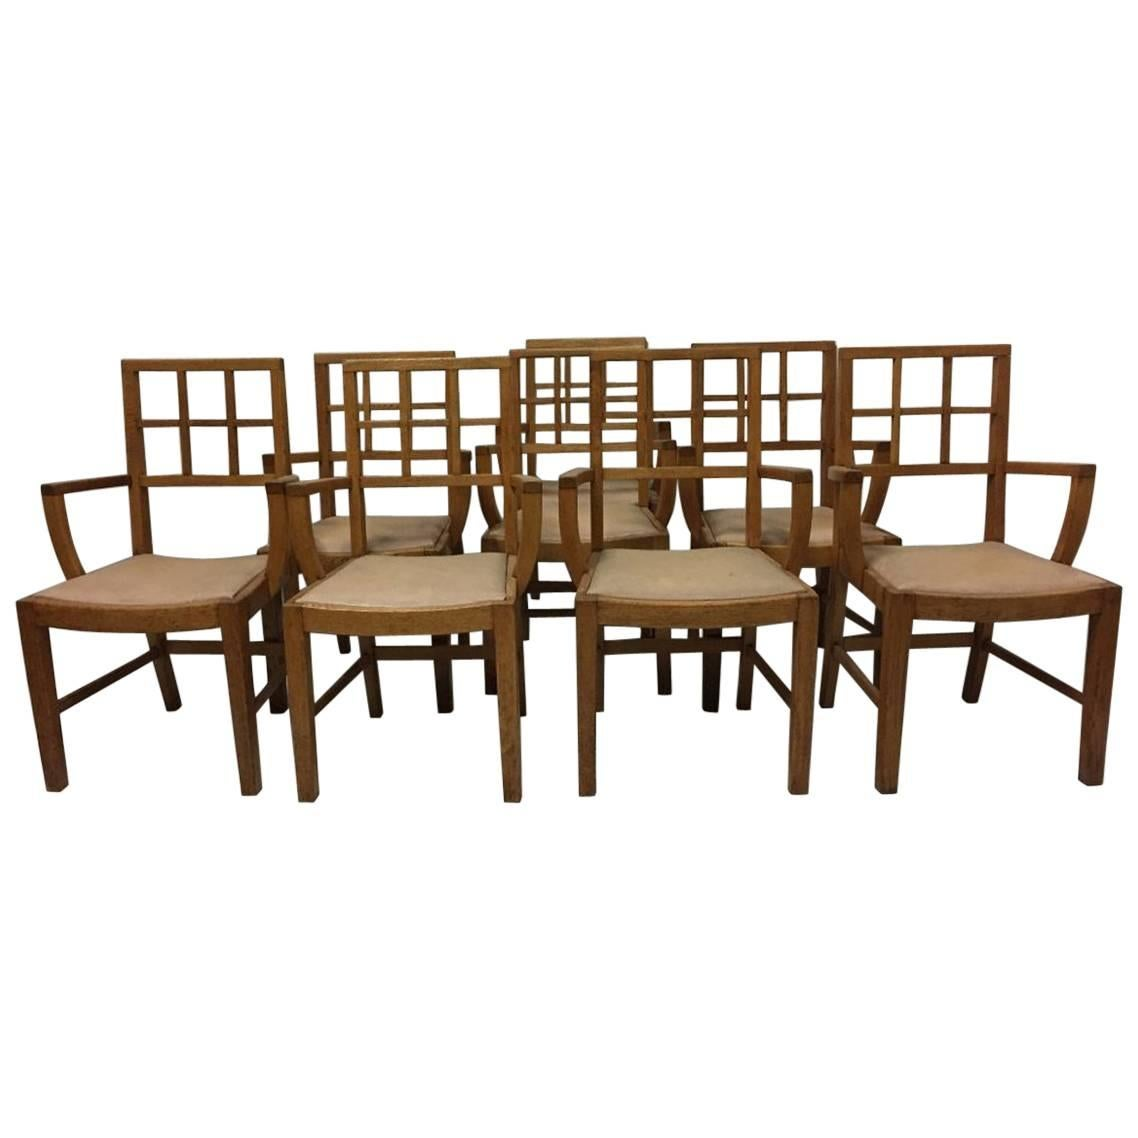 Heals of London Attri, A set of 8 Lattice Back Oak Arts & Crafts Armchairs